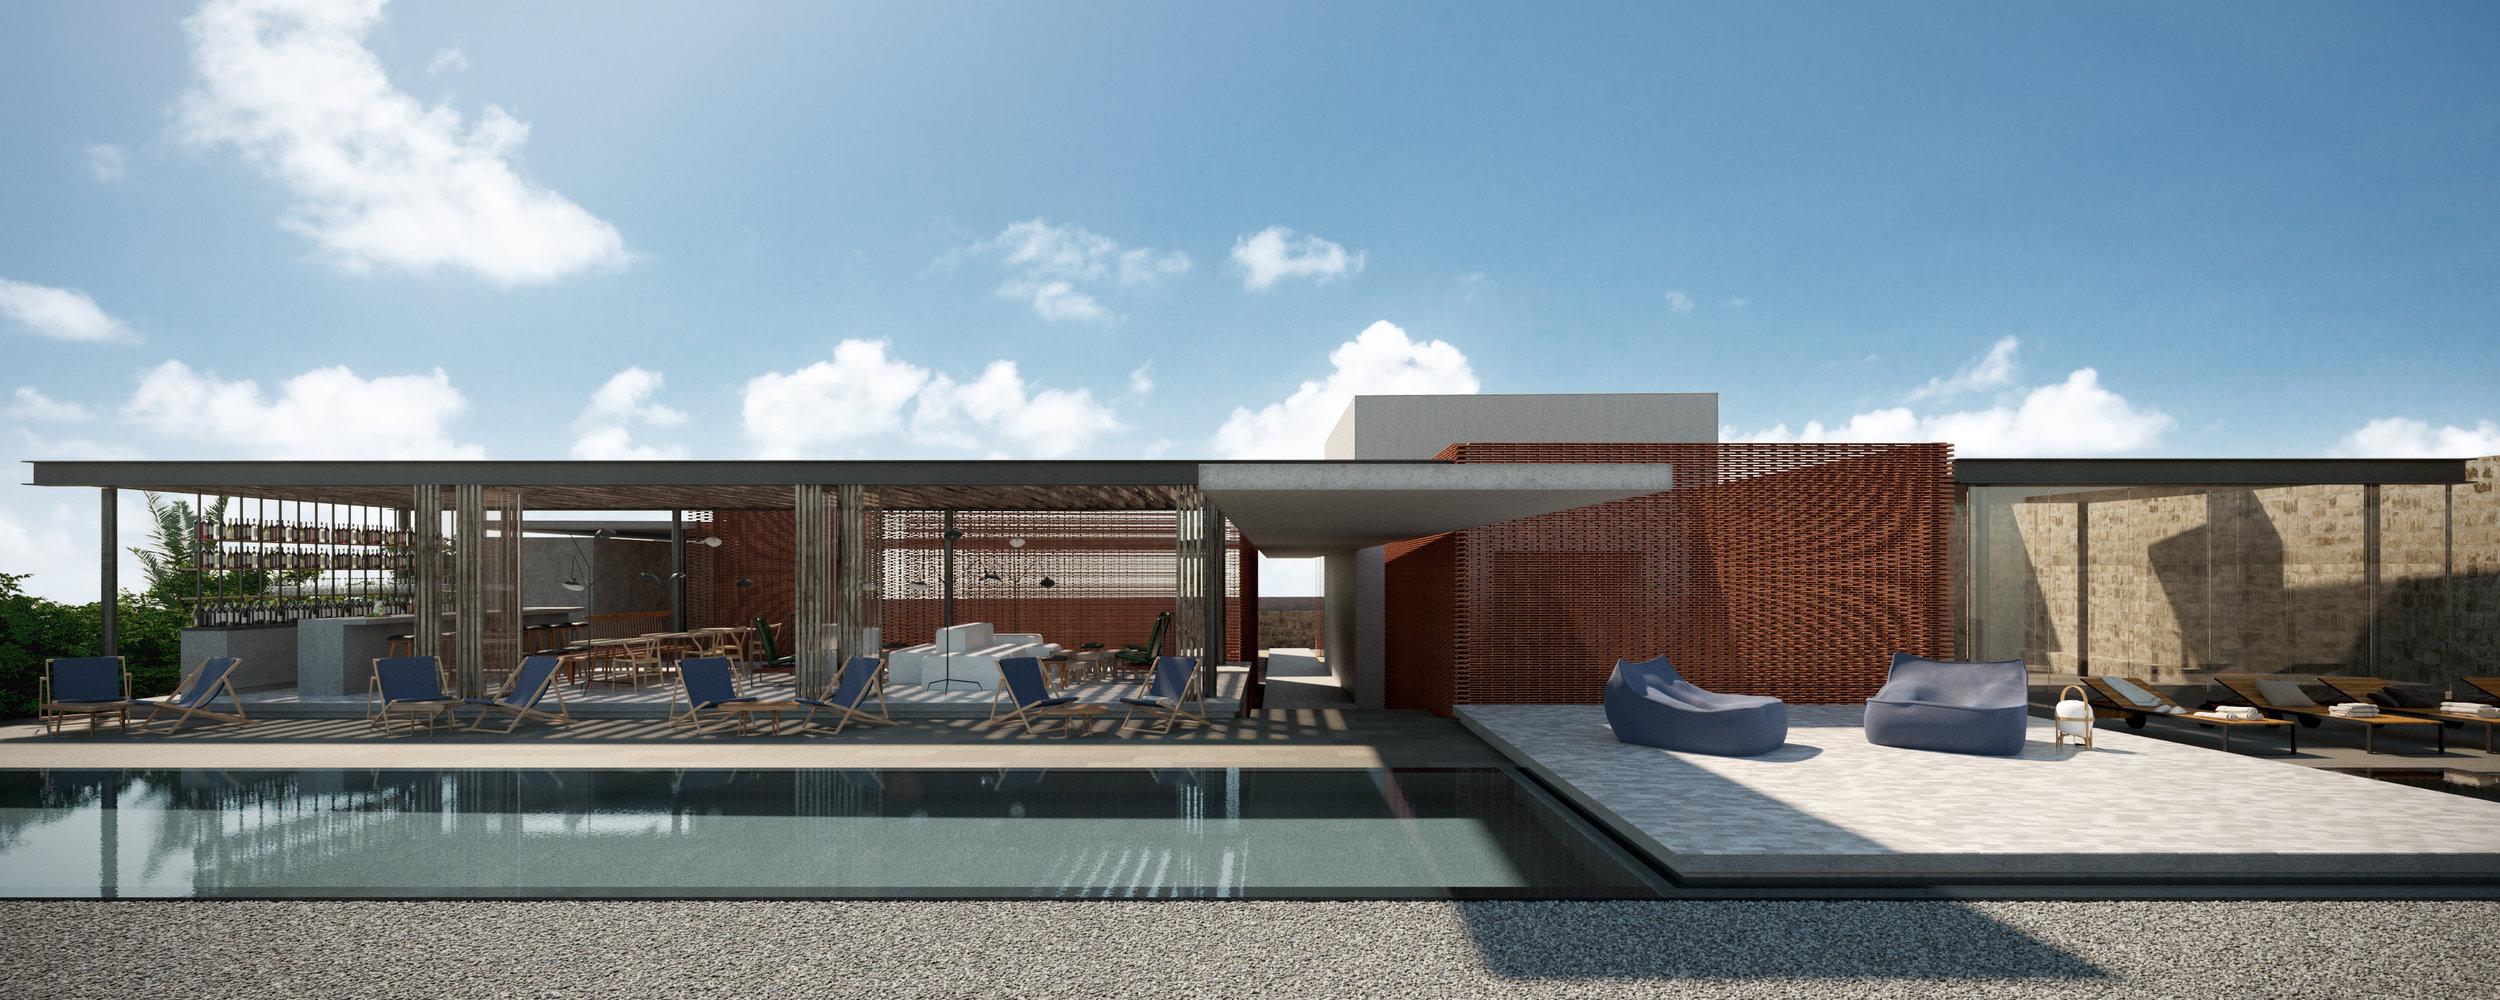 CheremArquitectos_CurioZacatecas_Roof.jpg